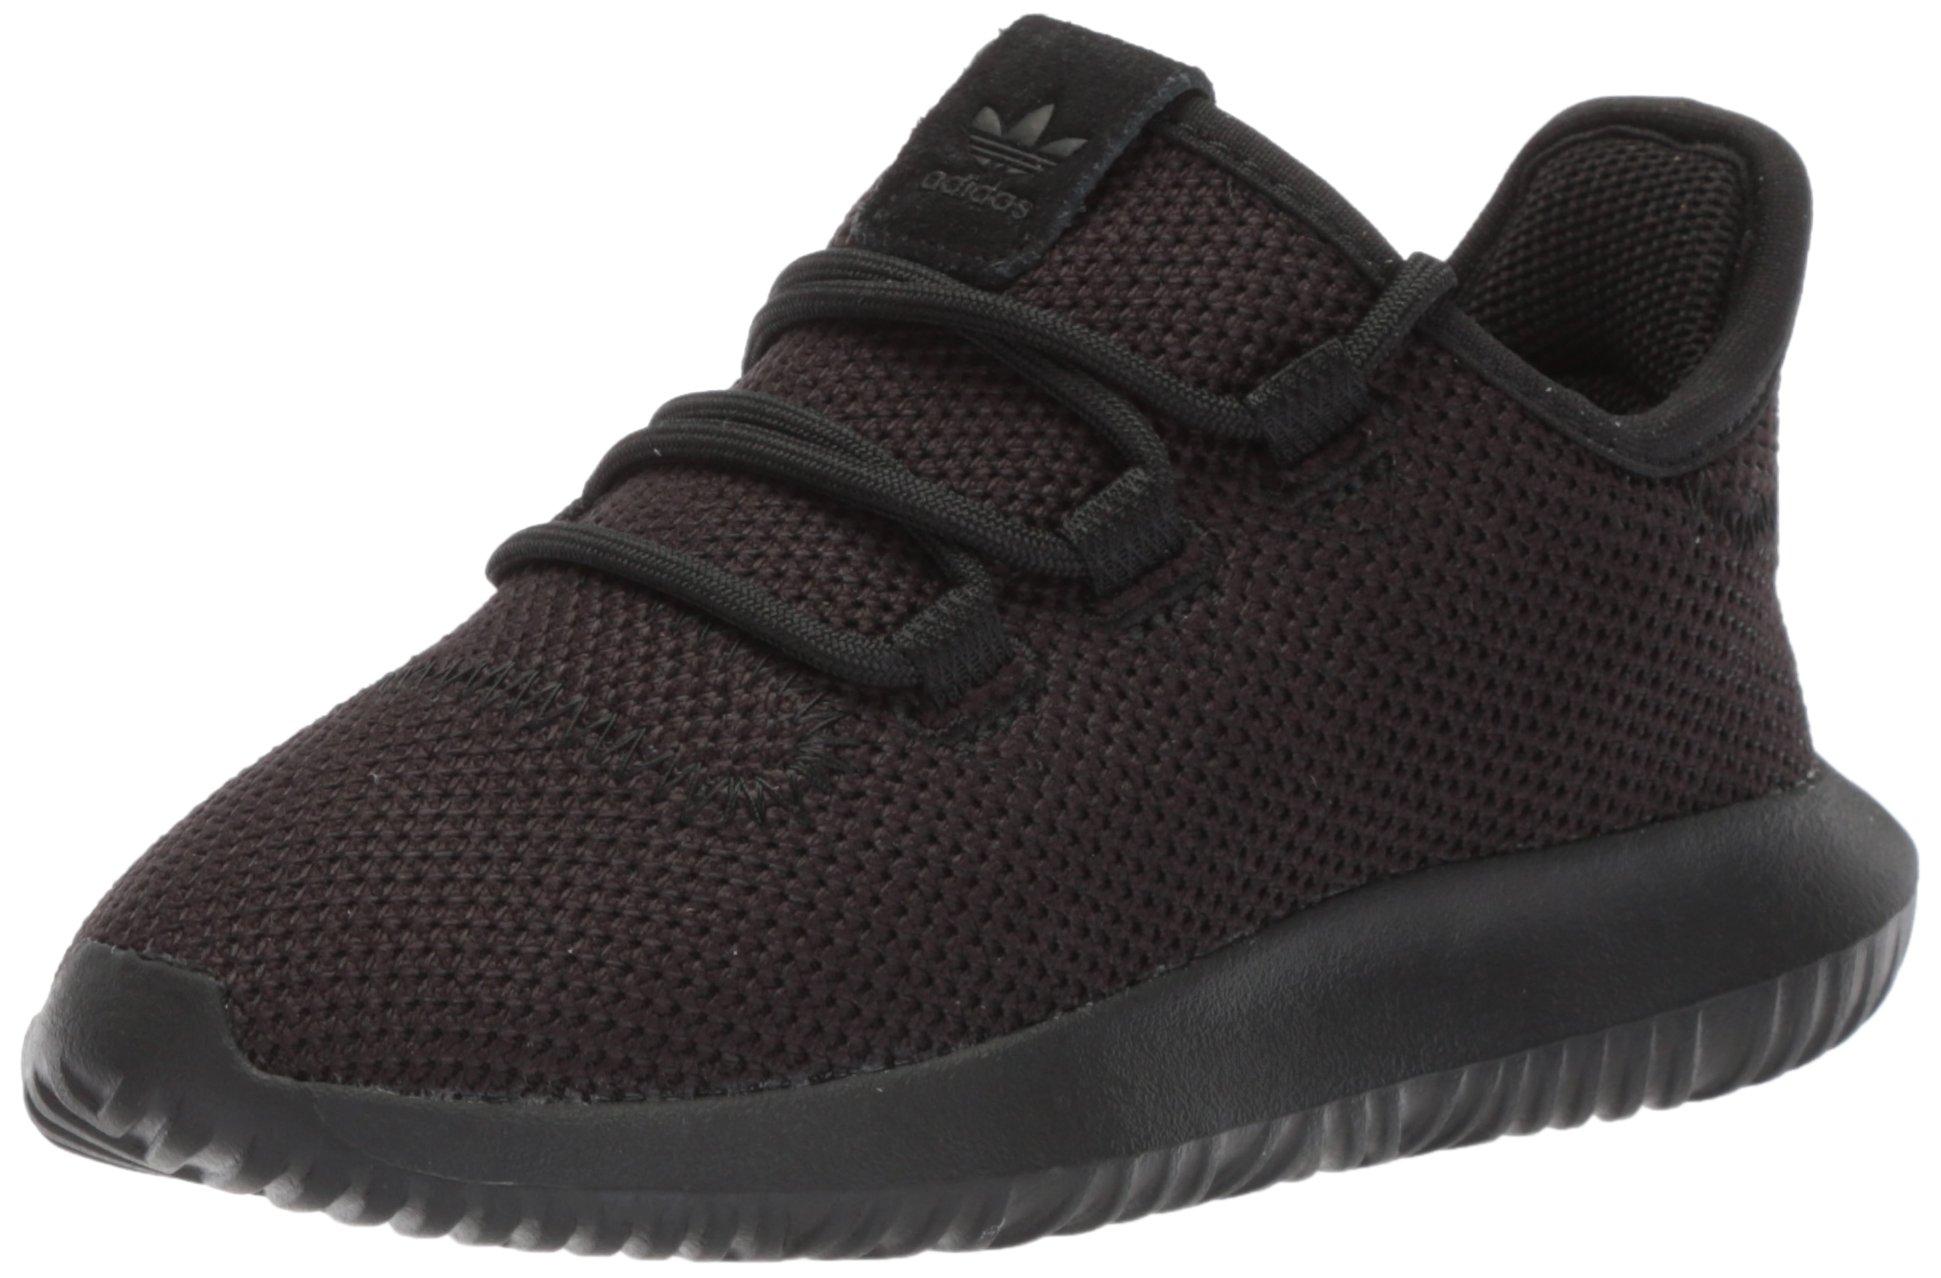 adidas Originals Unisex Tubular Shadow Running Shoe, White/Black, 1.5 M US Little Kid